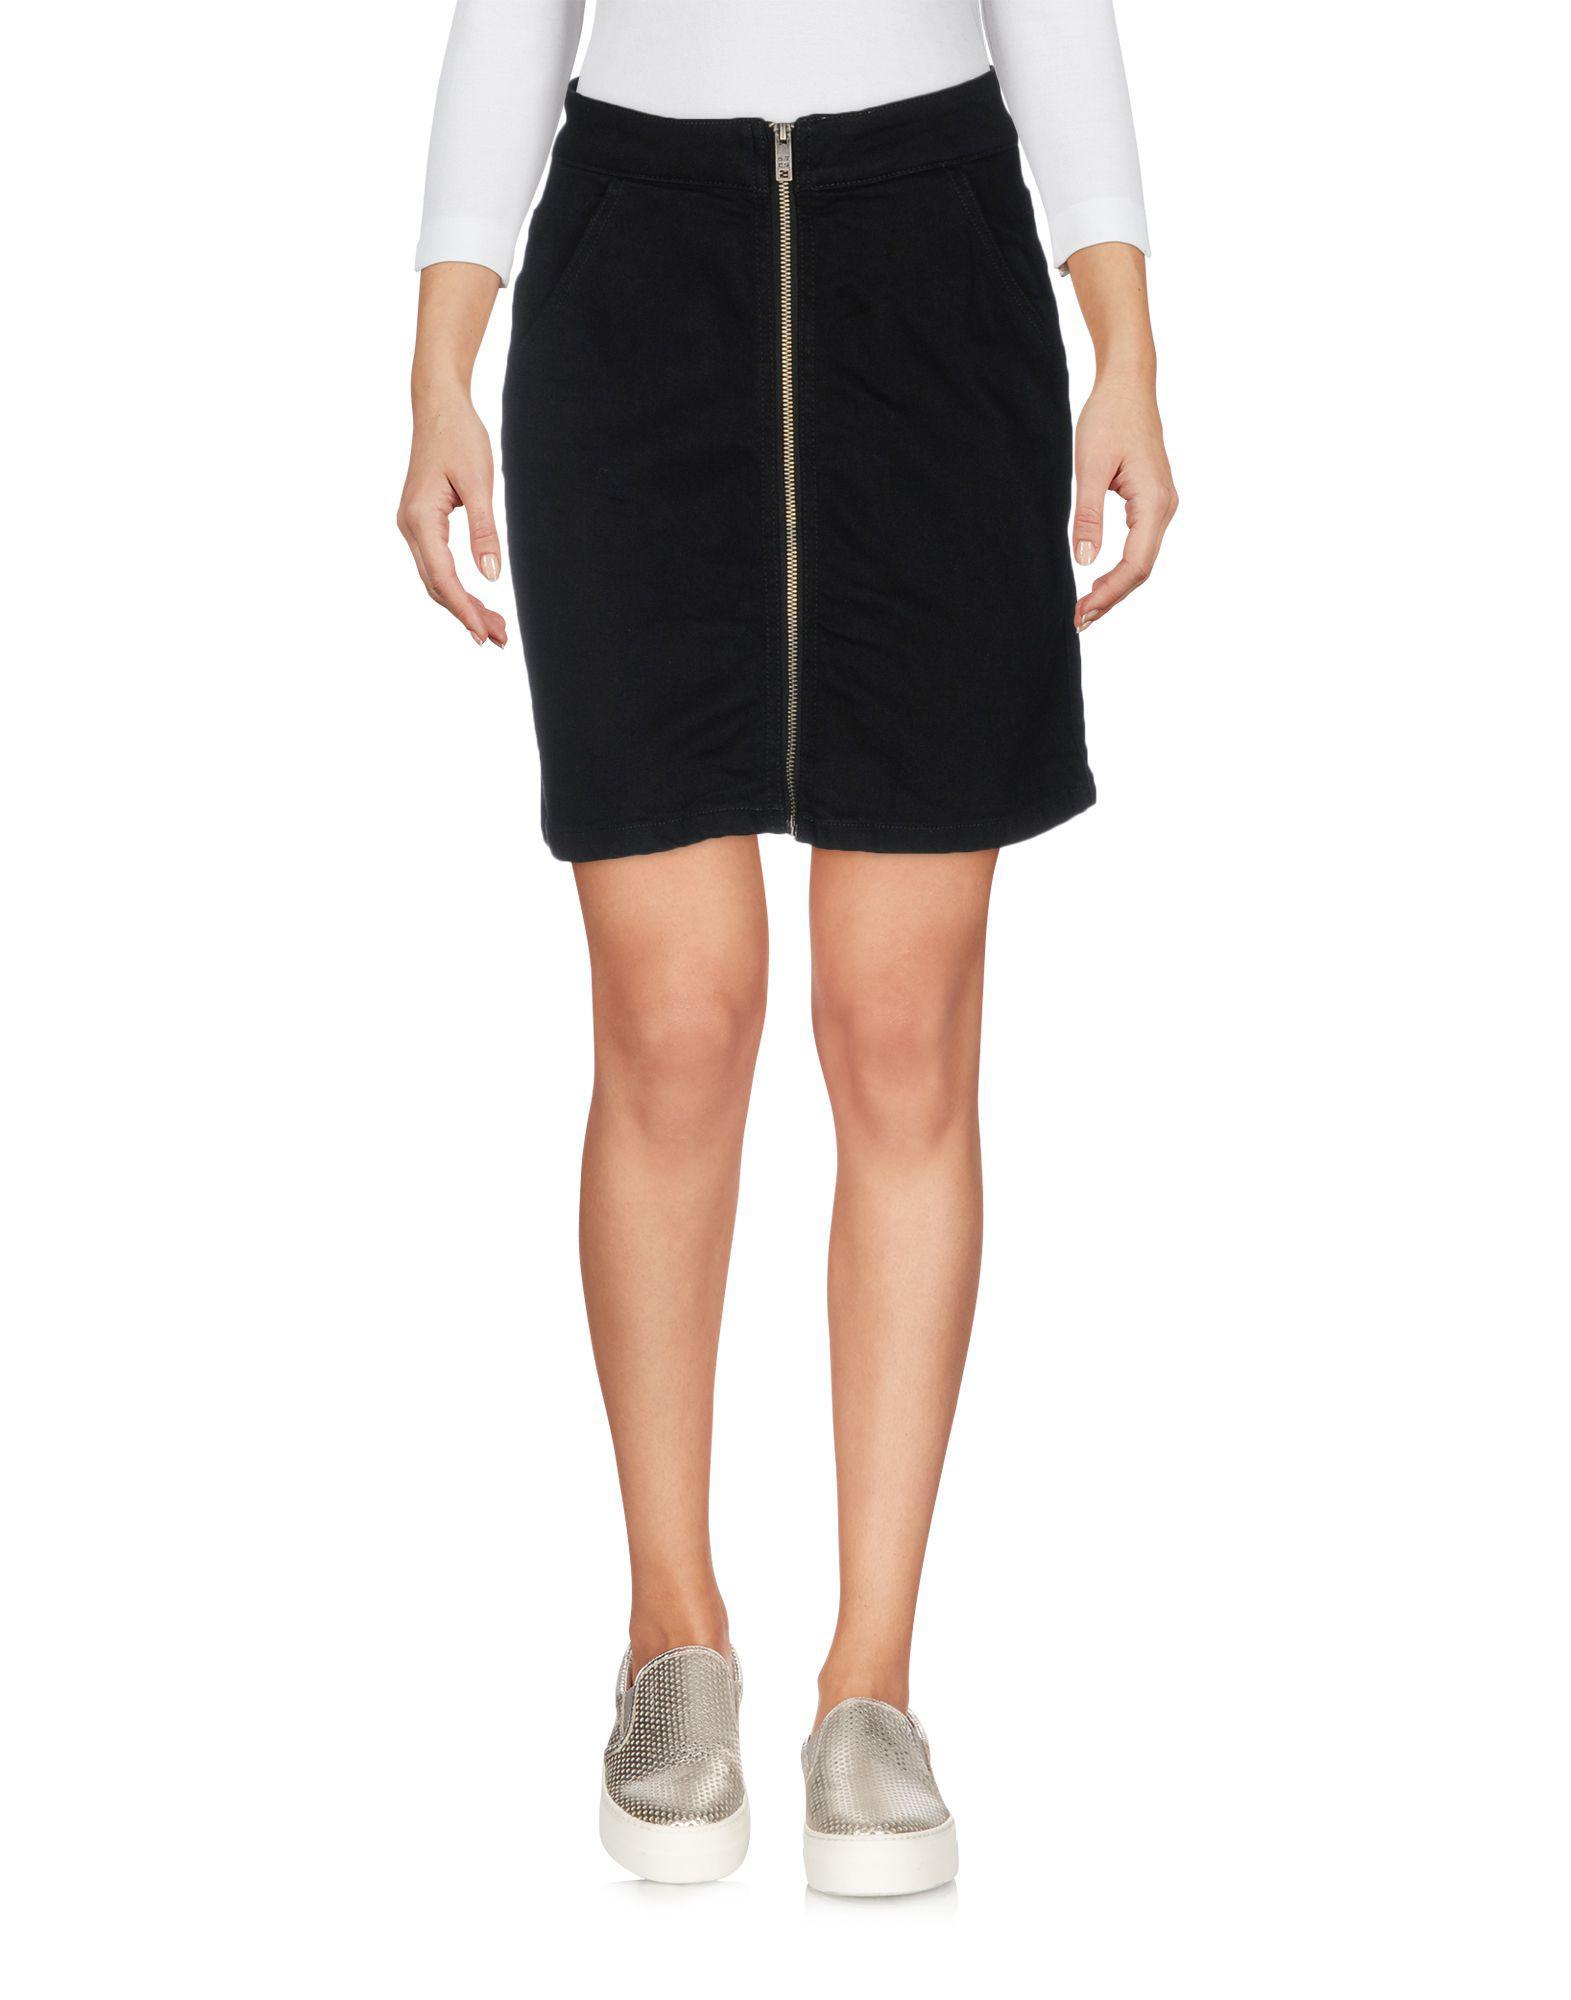 Superdry Denim Skirt in Black - Lyst b75d32f2f09c